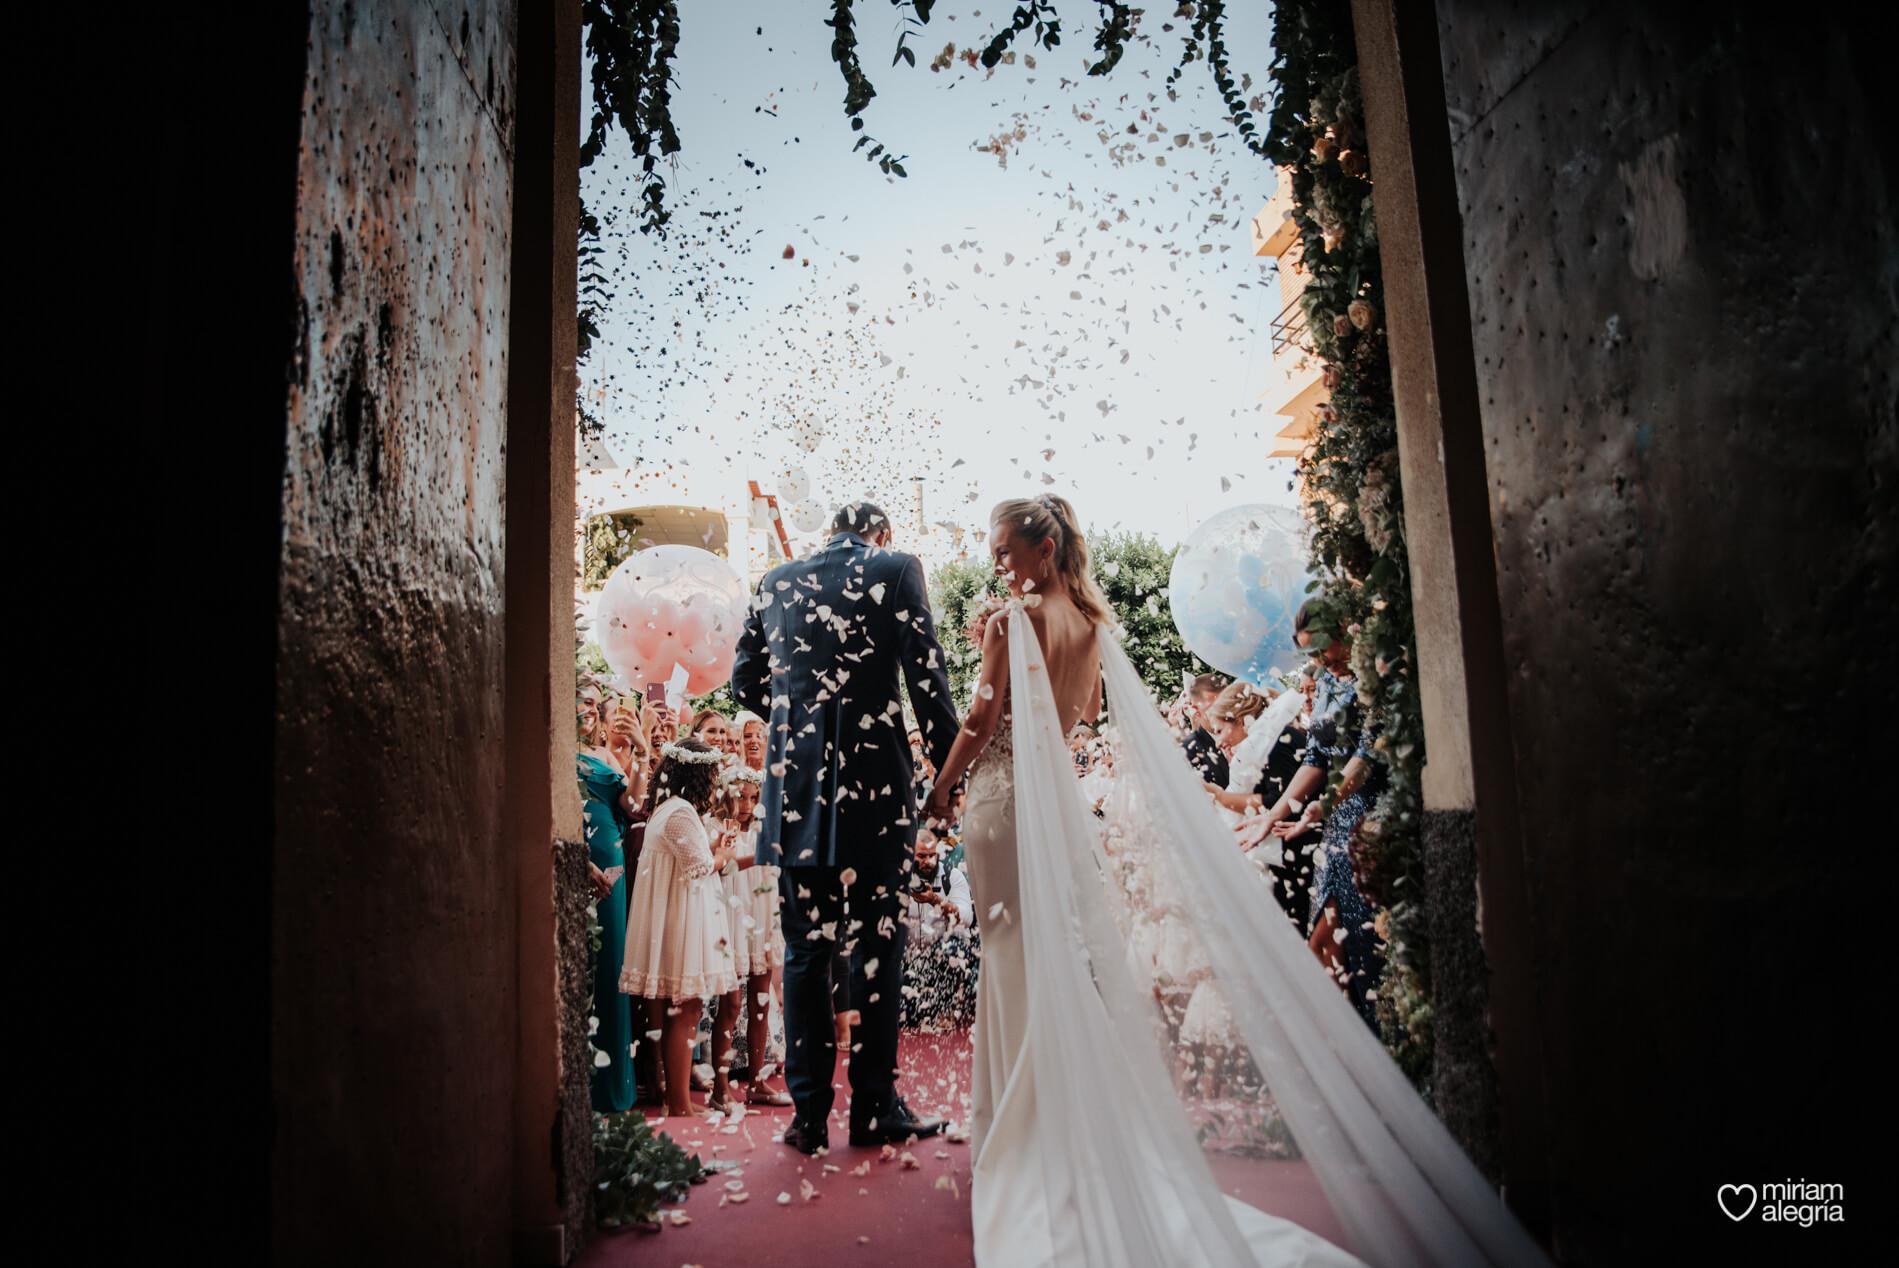 boda-en-almeria-miriam-alegria-137